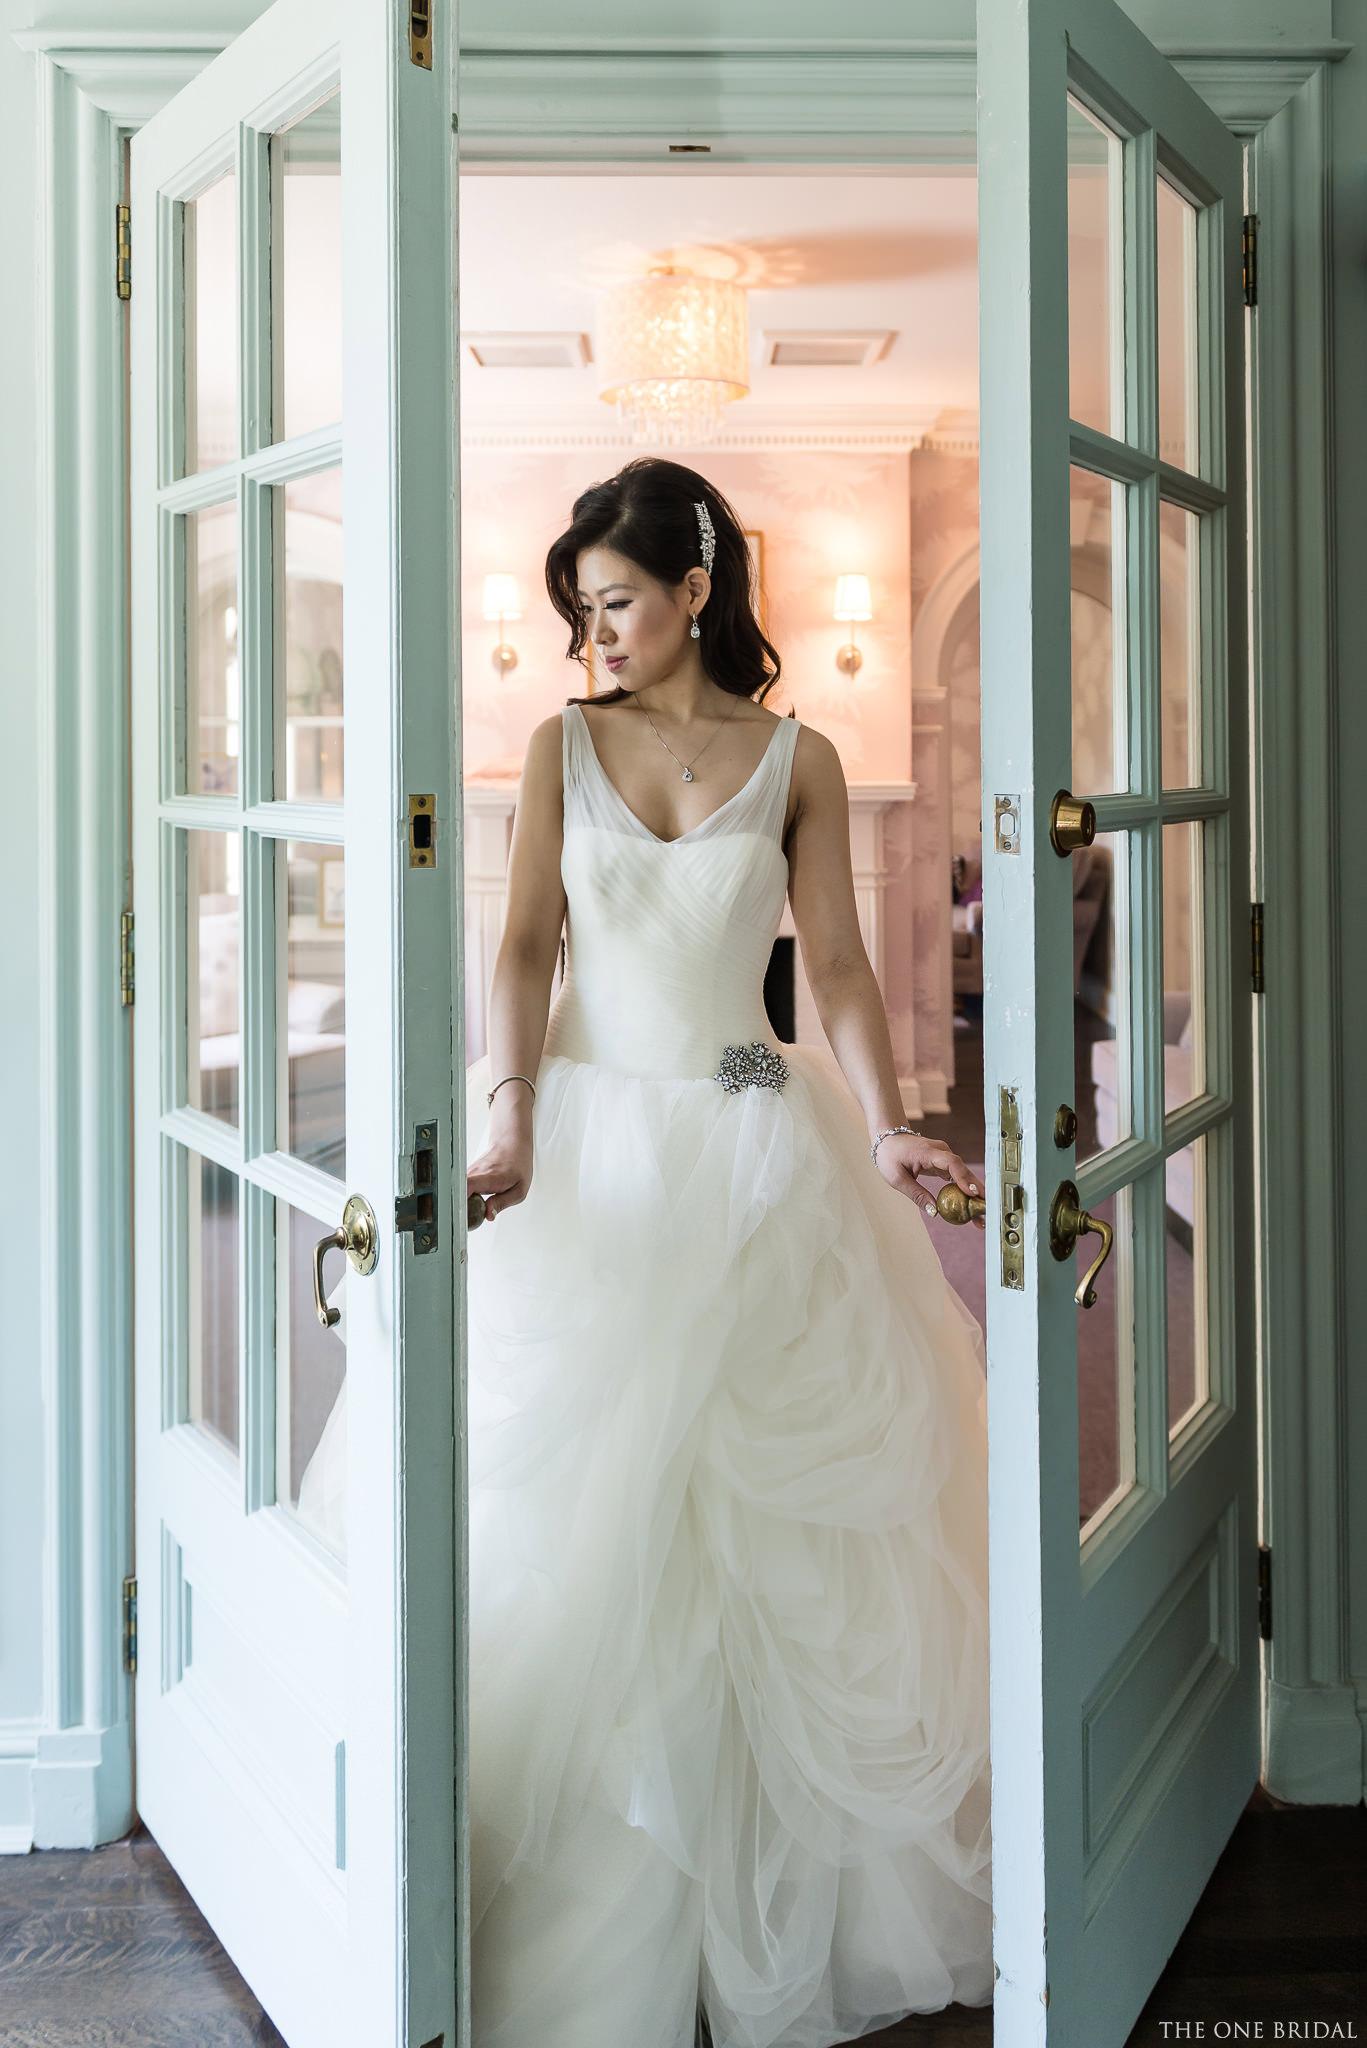 estates-of-sunnybrook-mclean-house-wedding-the-one-bridal-16